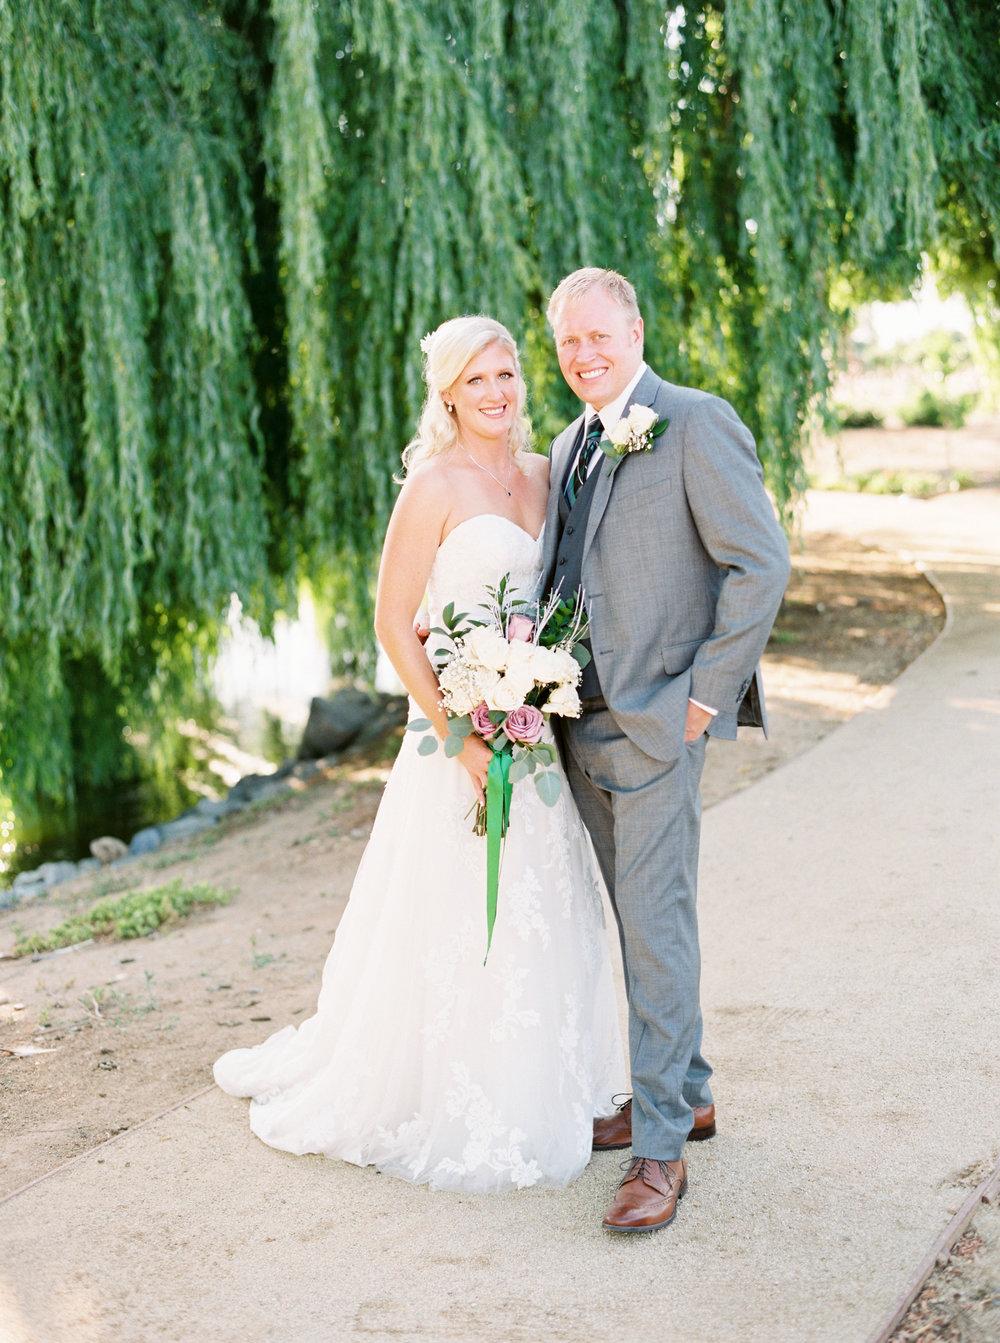 wolfe-heights-event-center-wedding-sacramento-california-wedding-68.jpg